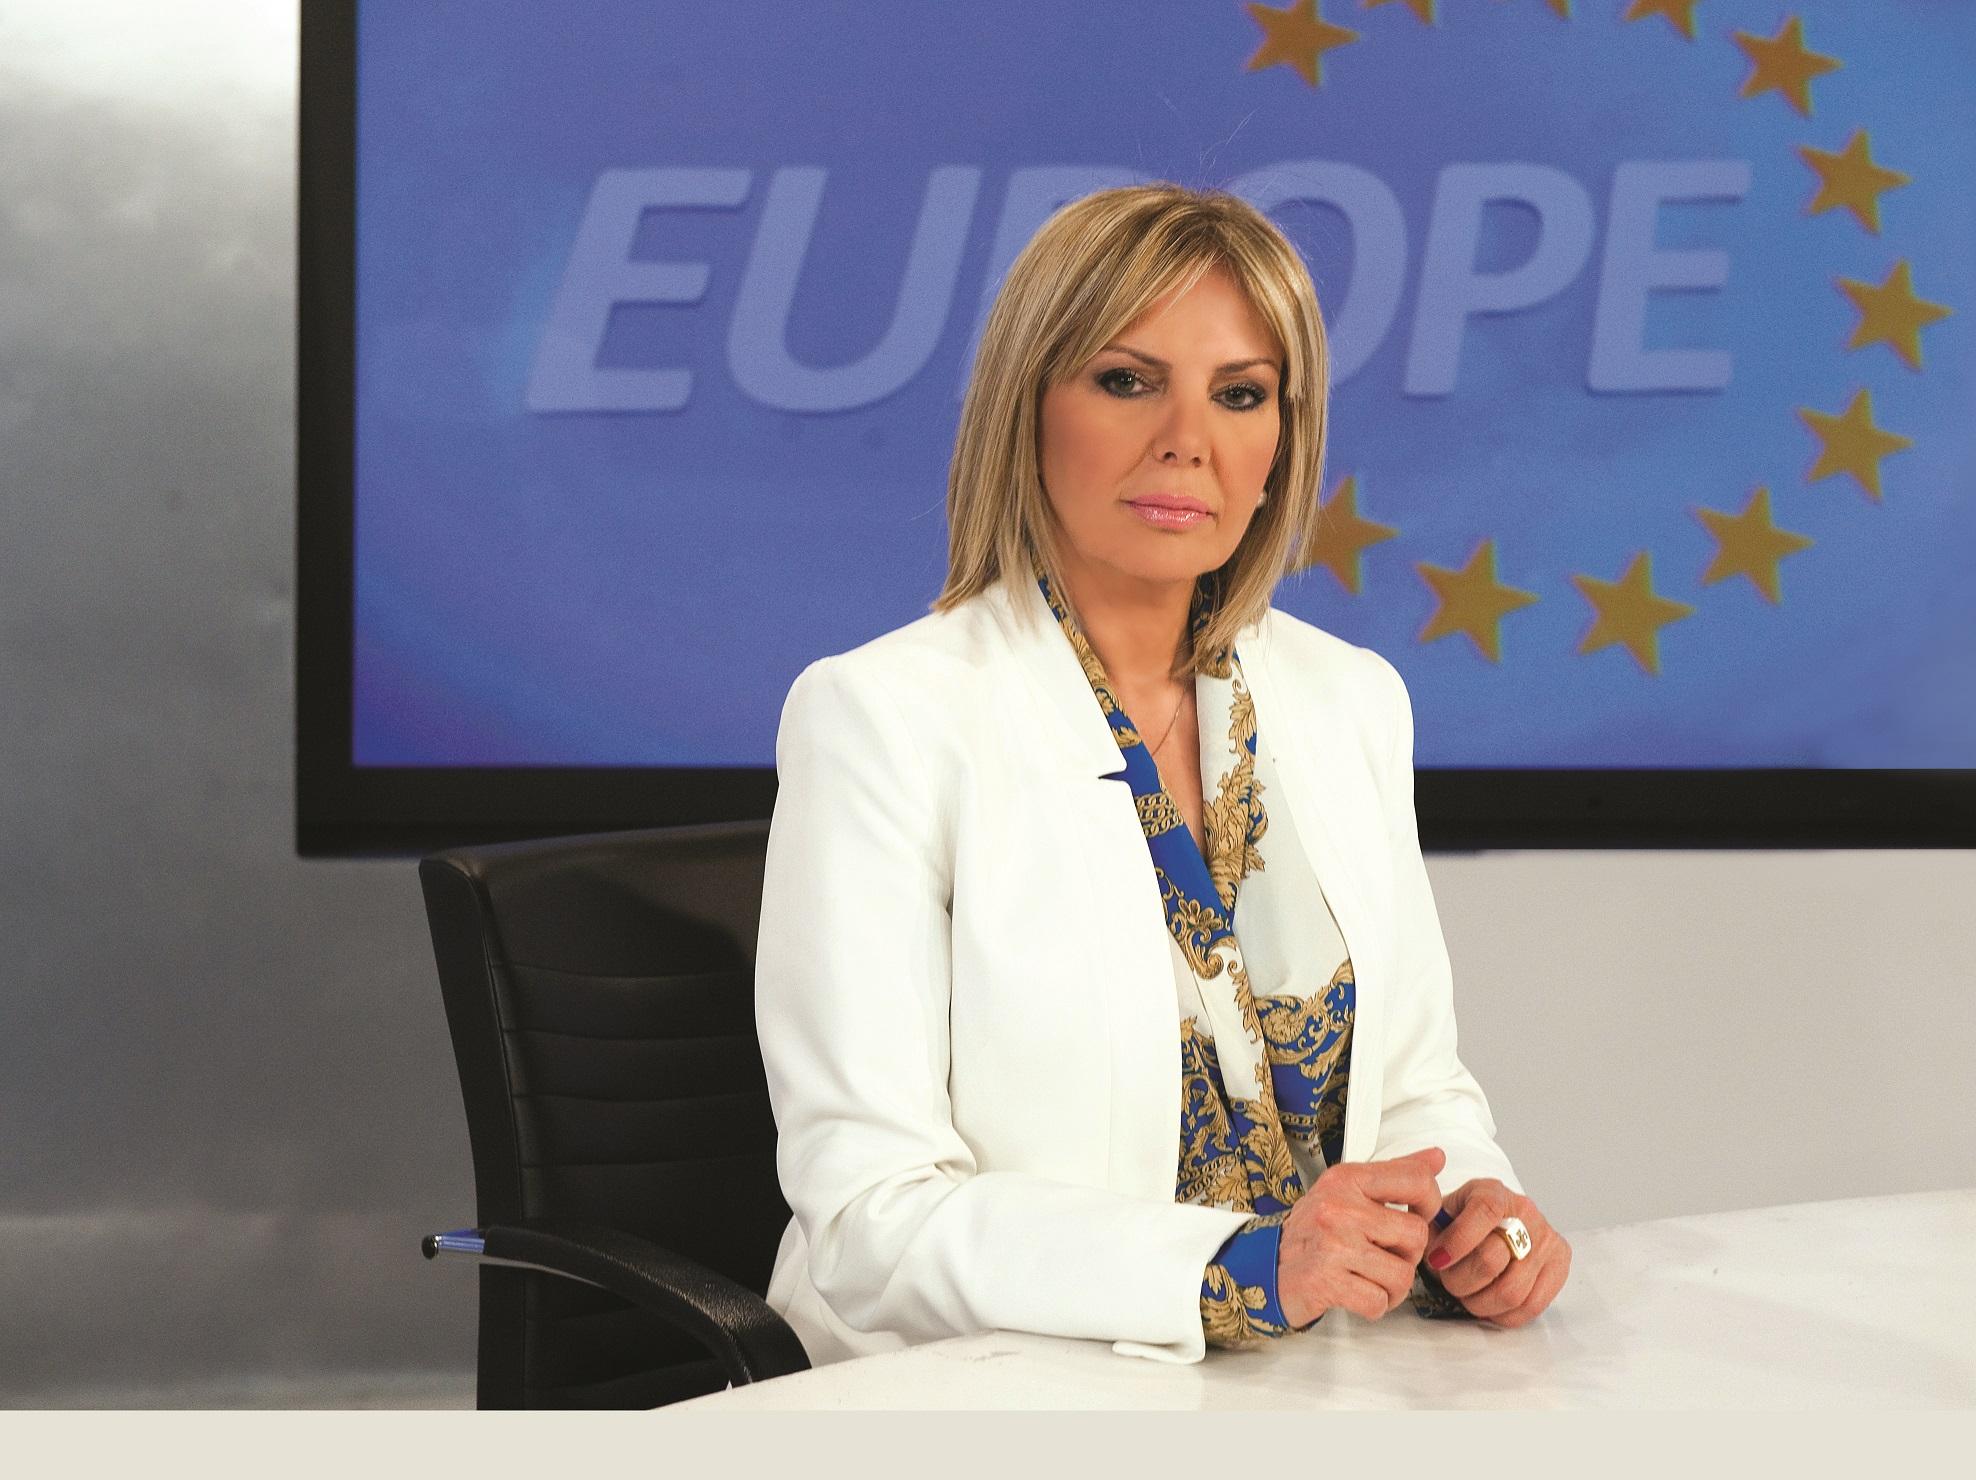 Eva Boura